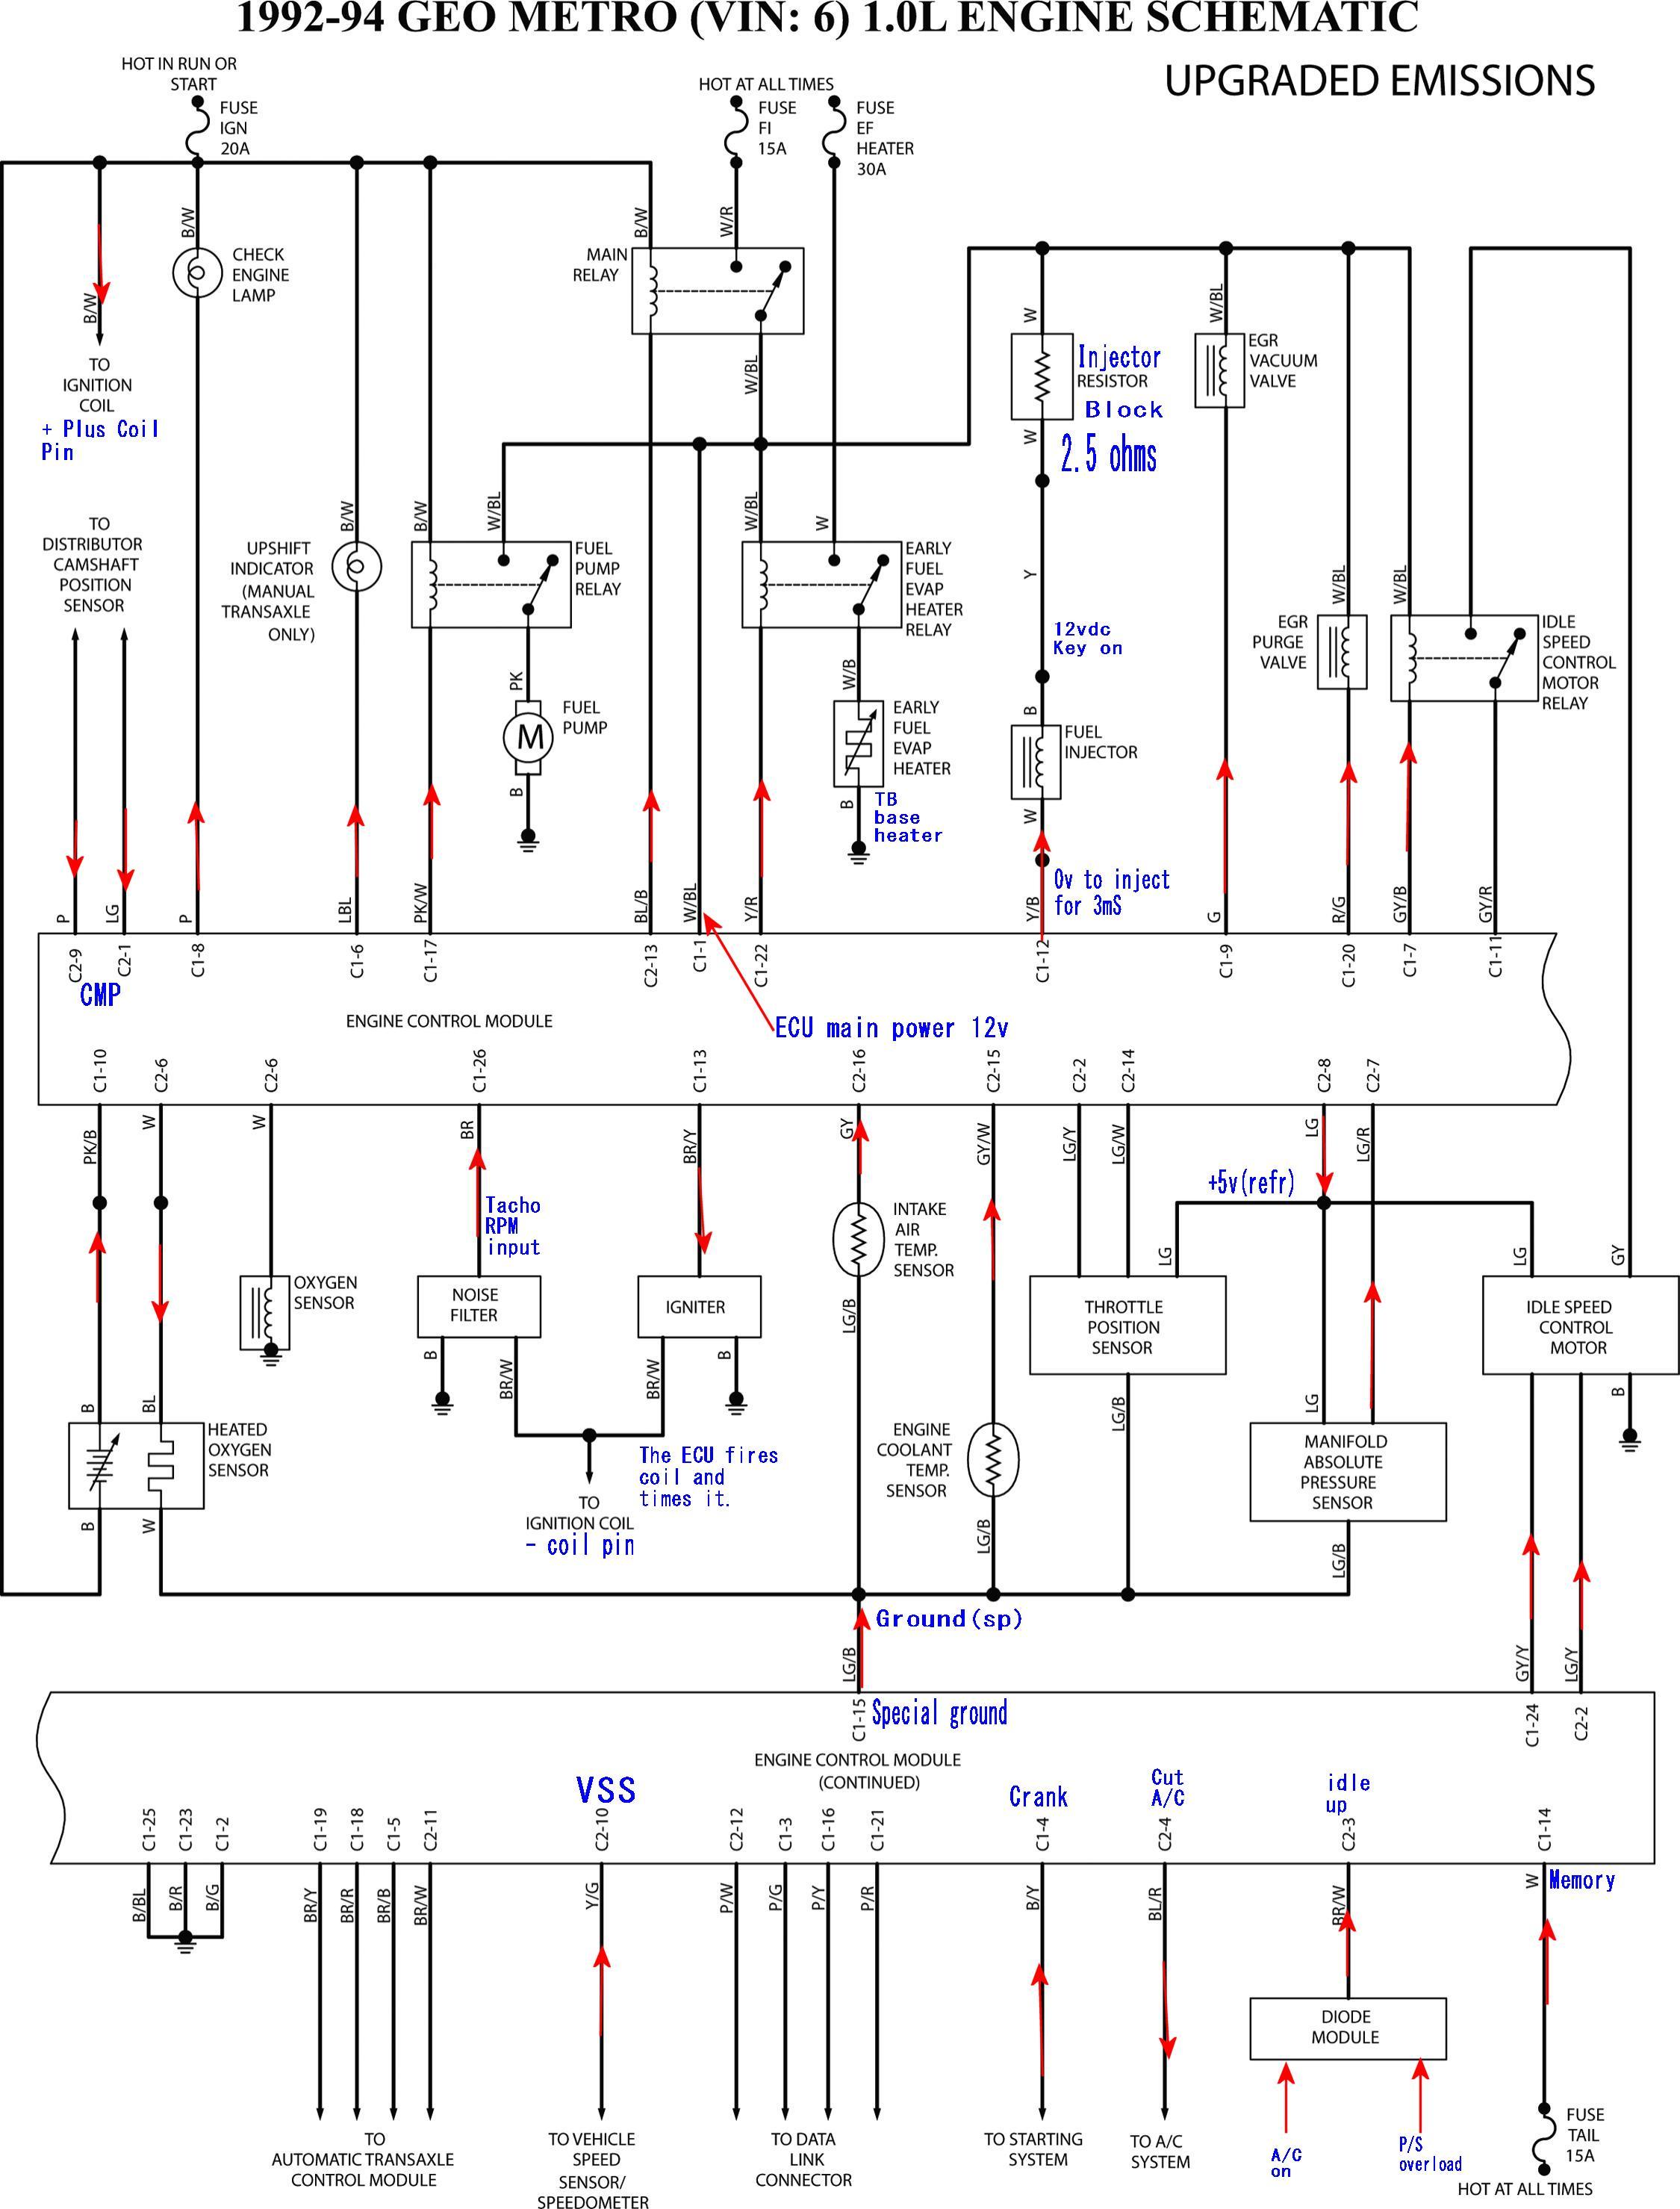 Chevrolet 350 Tbi Wire Diagrams Reinvent Your Wiring Diagram 94 Jeep Fuel System Free Download Schematic Coil Schematics Rh Enr Green Com 1995 Chevy 5 7 Engine